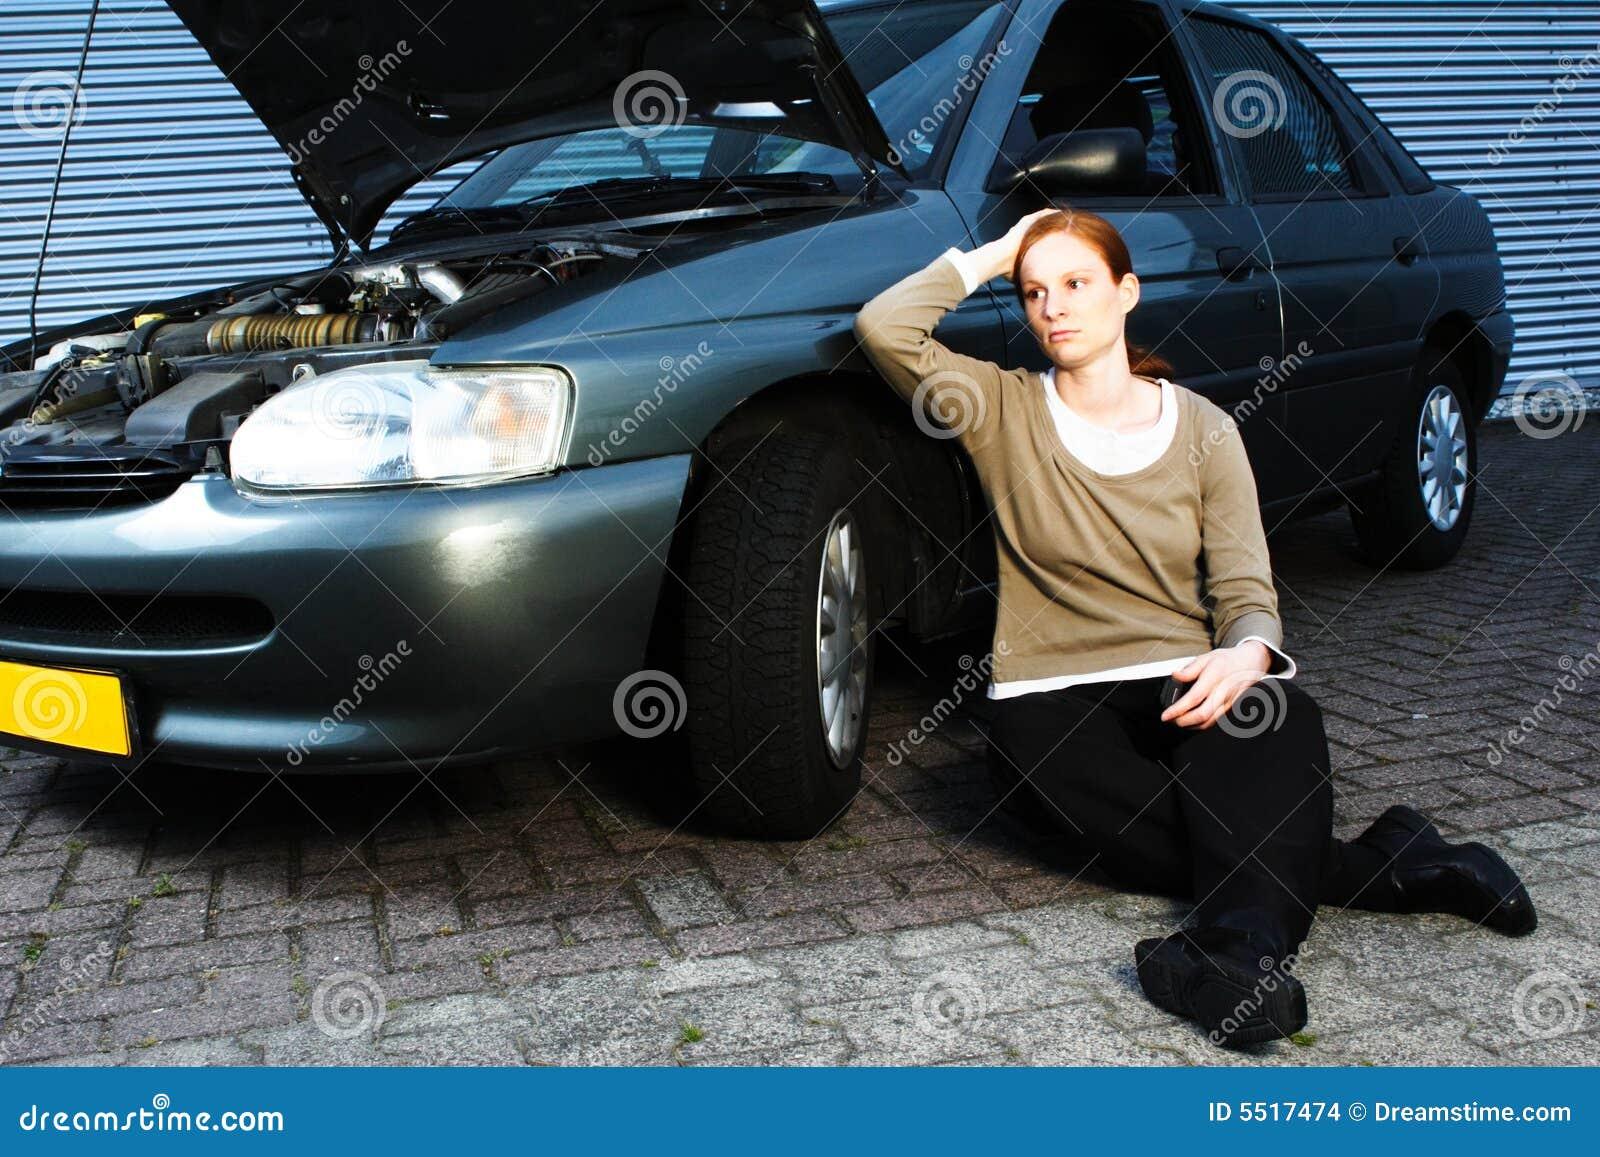 broken car and sad driver stock photo  image of vehicle